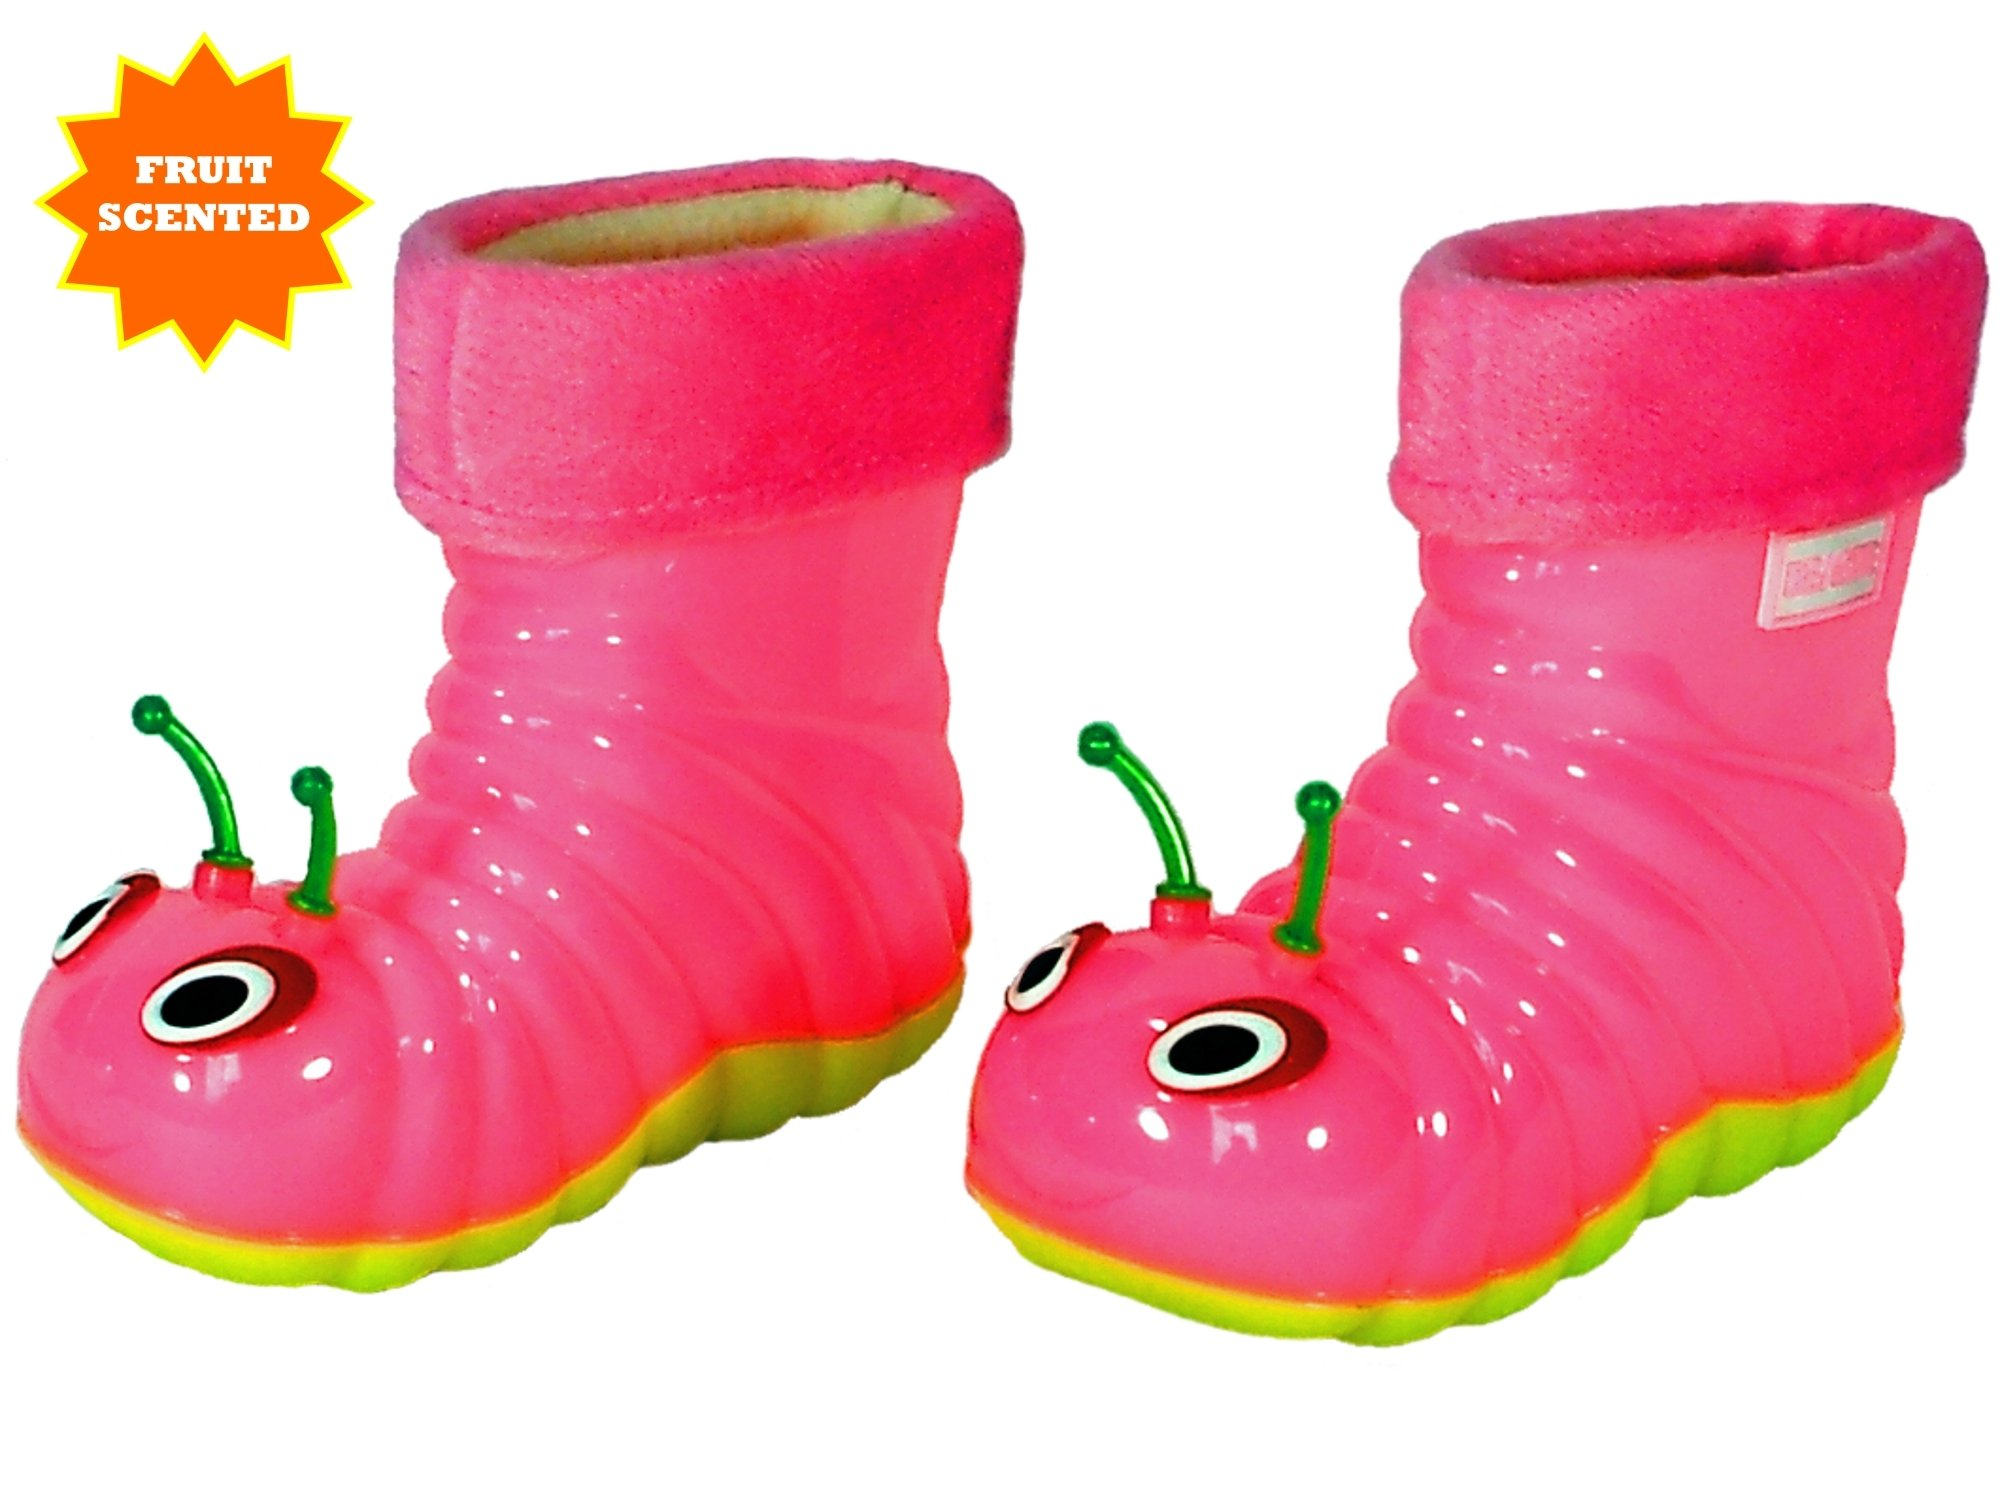 Children's Waterproof Rain Boots Cartoon Animals Toddler/Little Kid (28 (10 M US Toddler), Pink) by Beastie Shoes (Image #3)